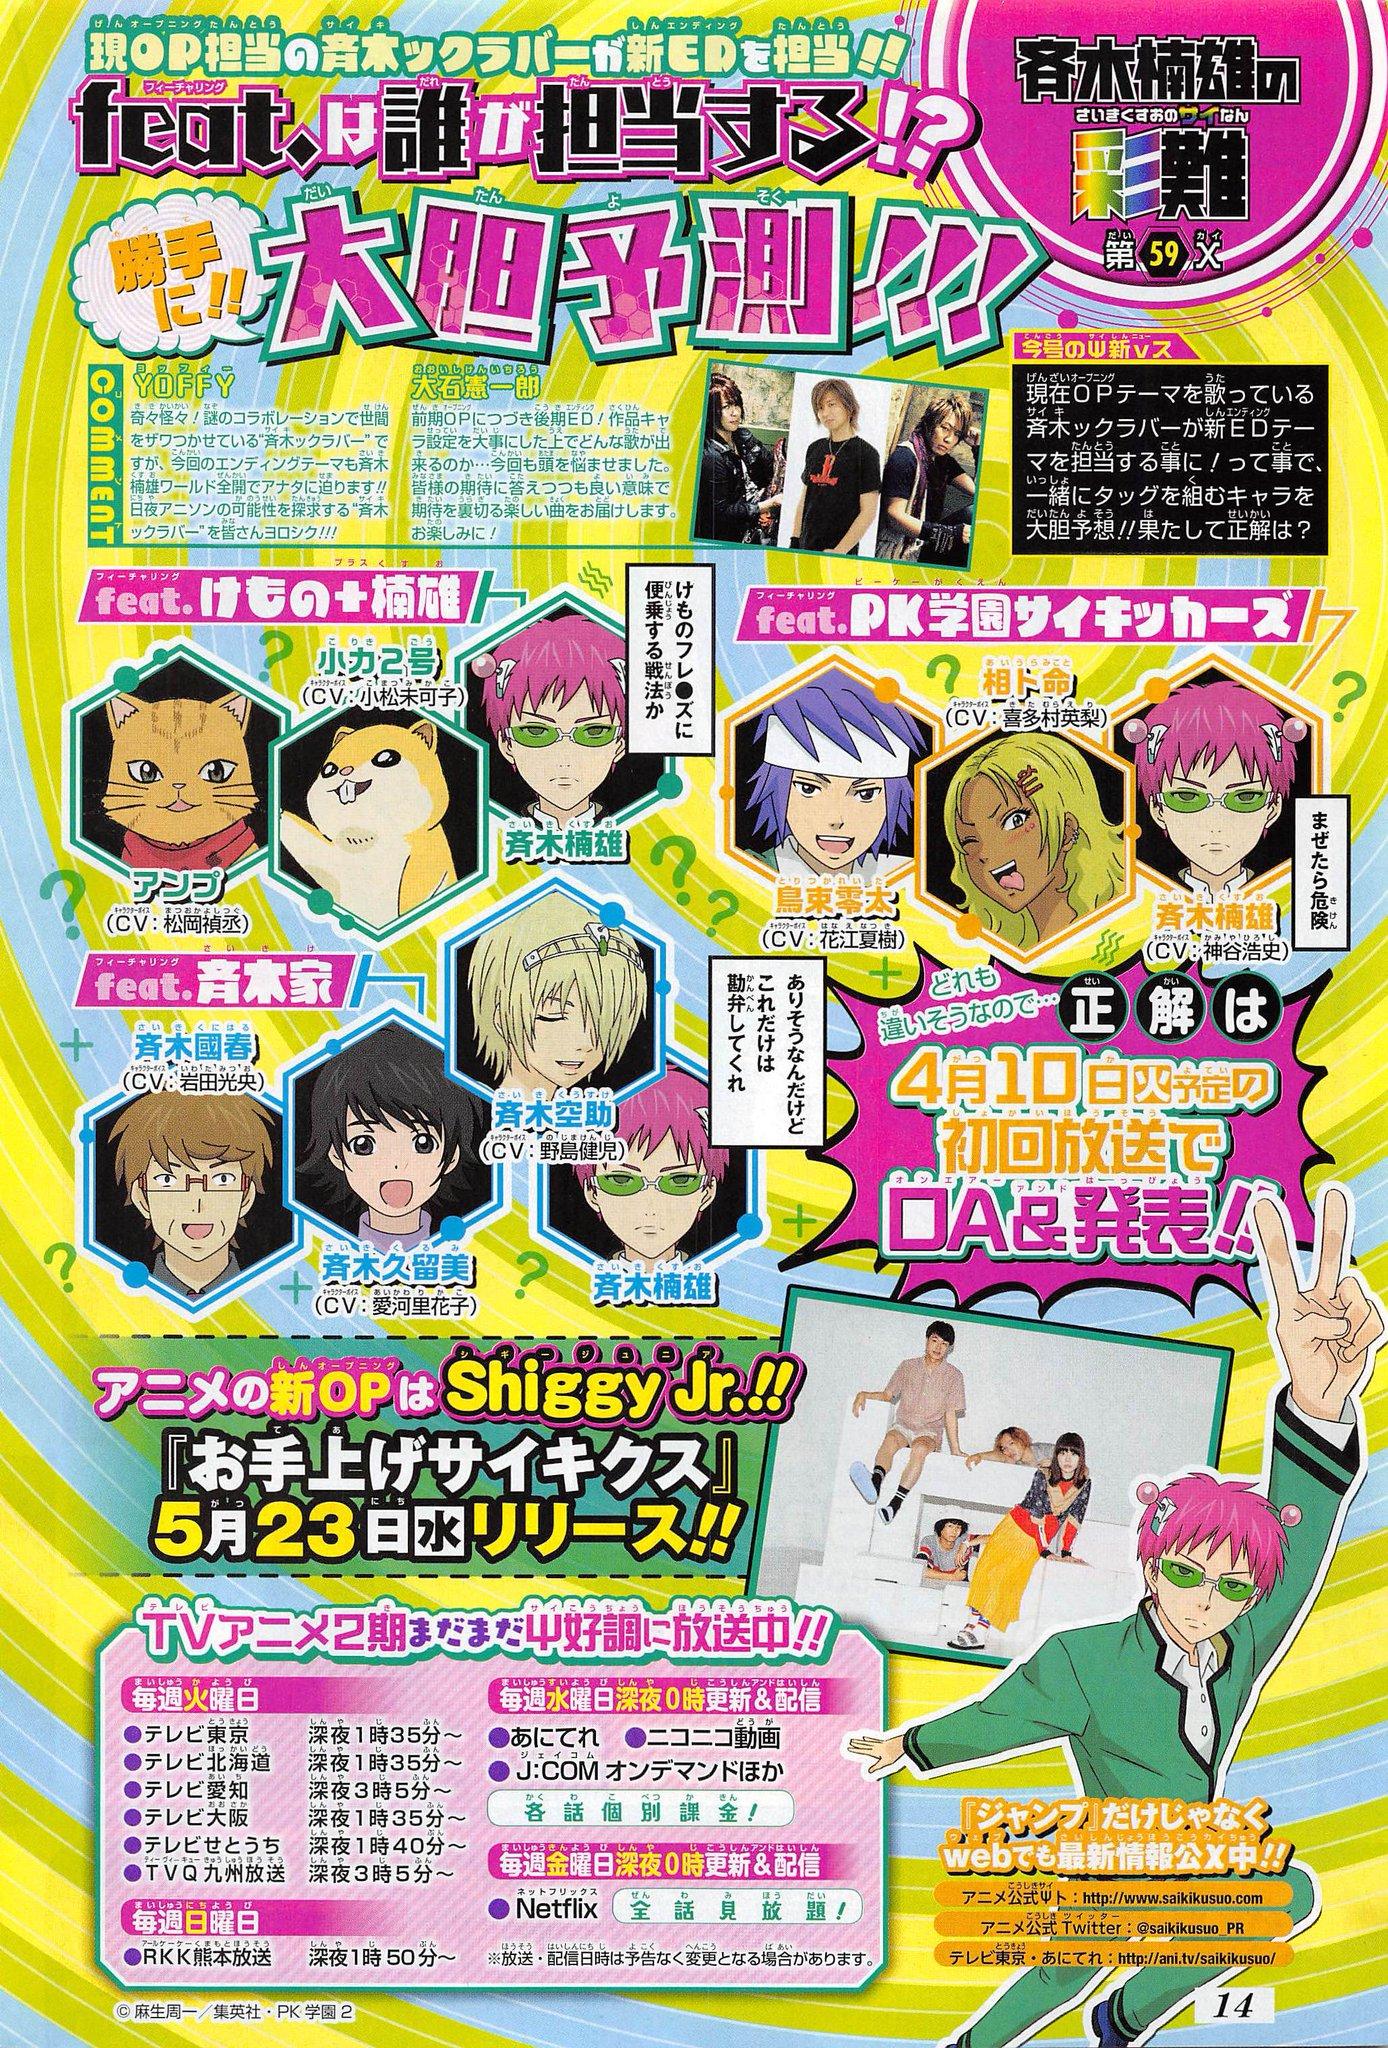 THE DISASTROUS LIFE OF SAIKI K  Season 2: Shiggy Jr  And